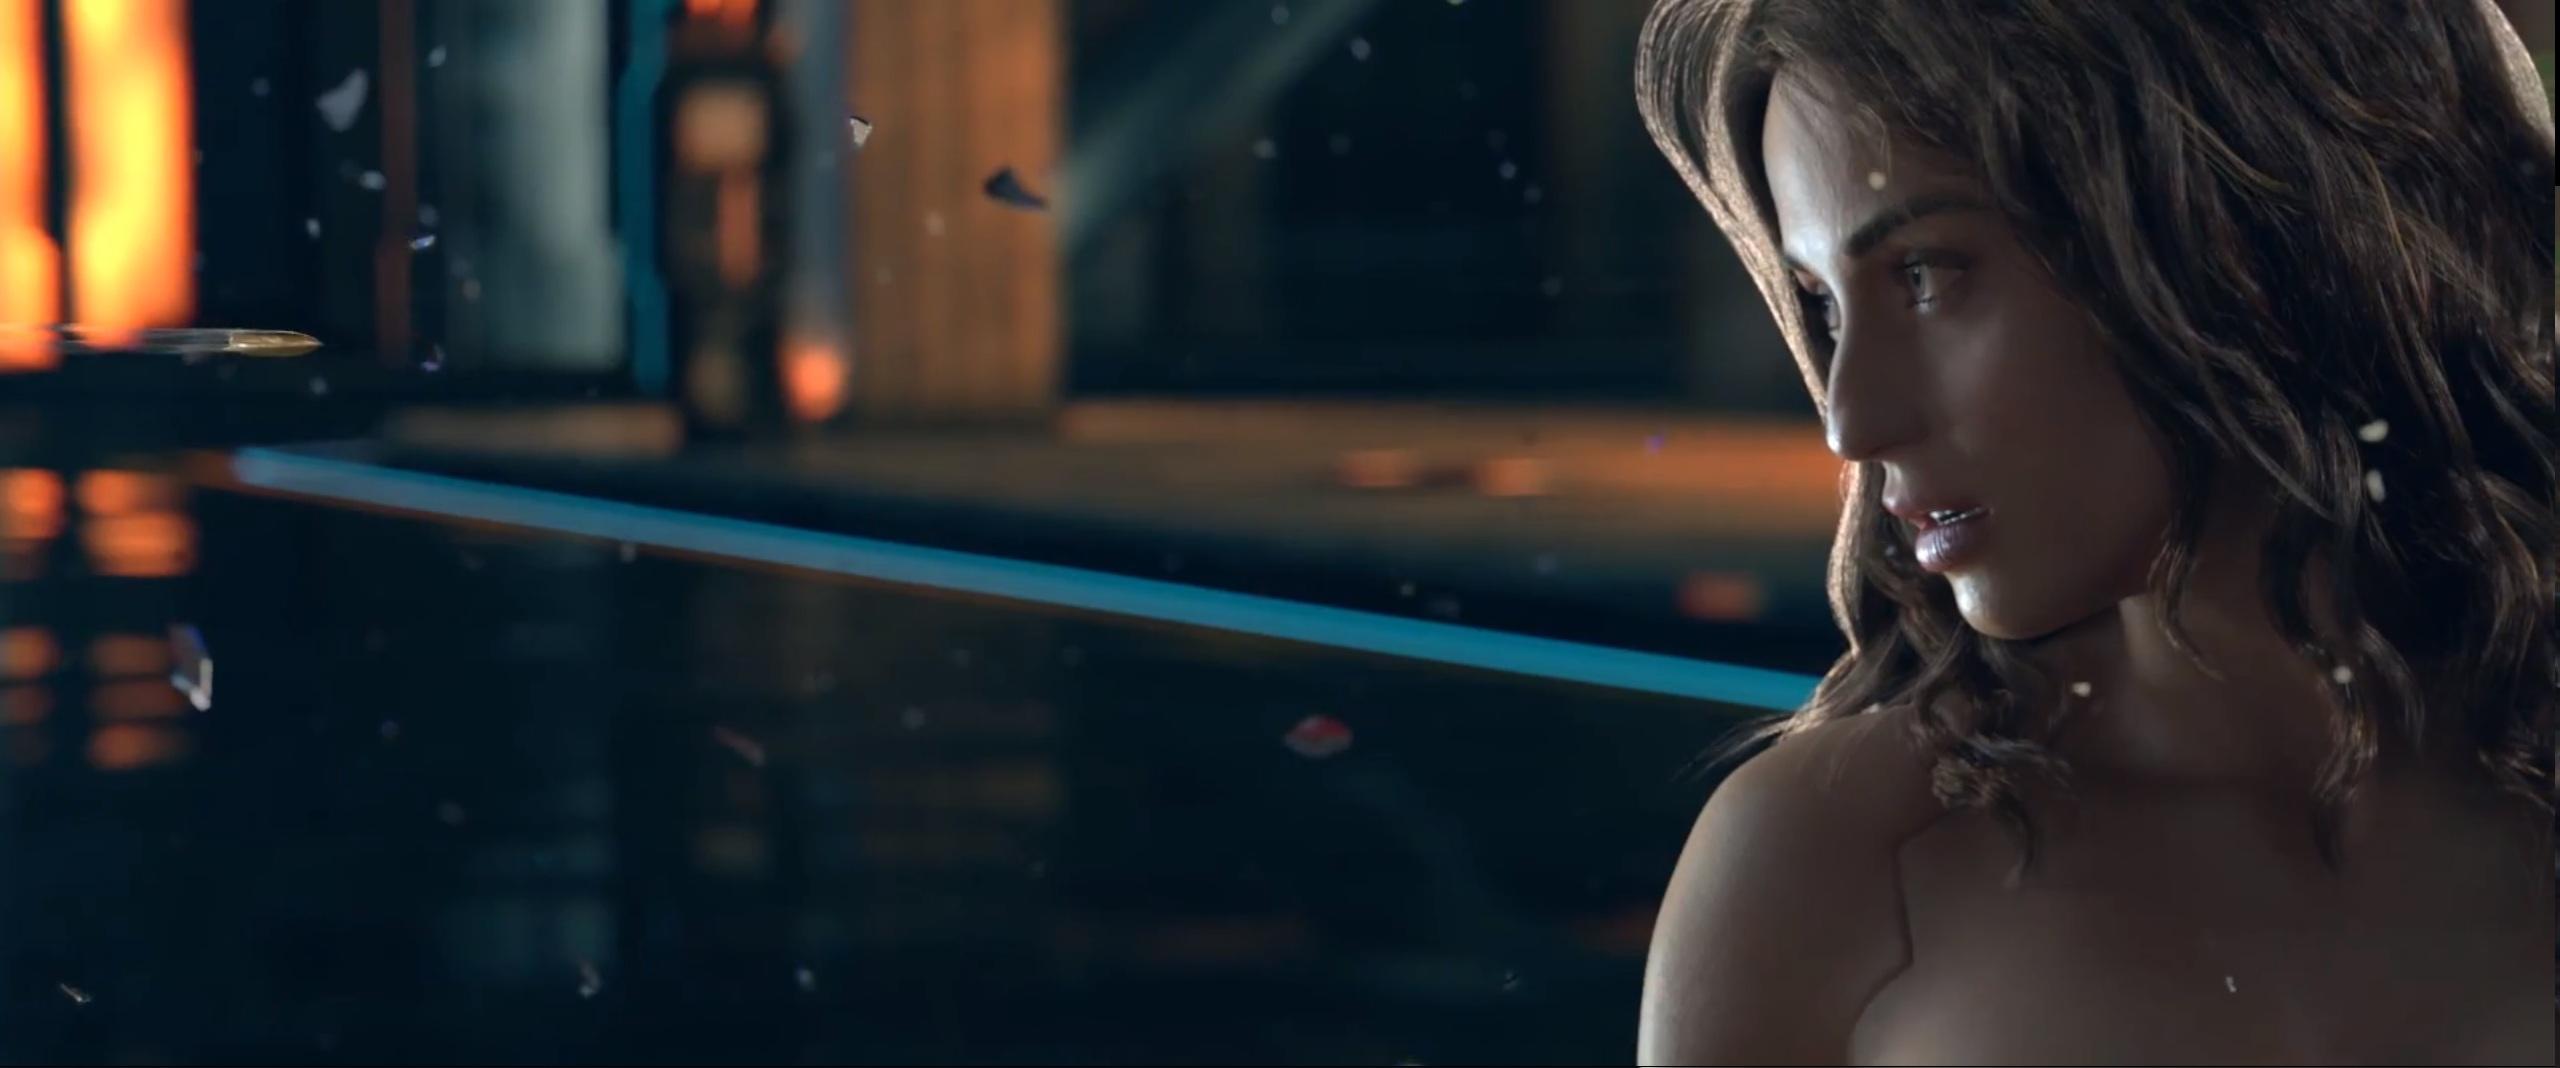 Msi Wallpaper Full Hd Cyberpunk 2077 Aims For Next Gen Consoles And Pcs